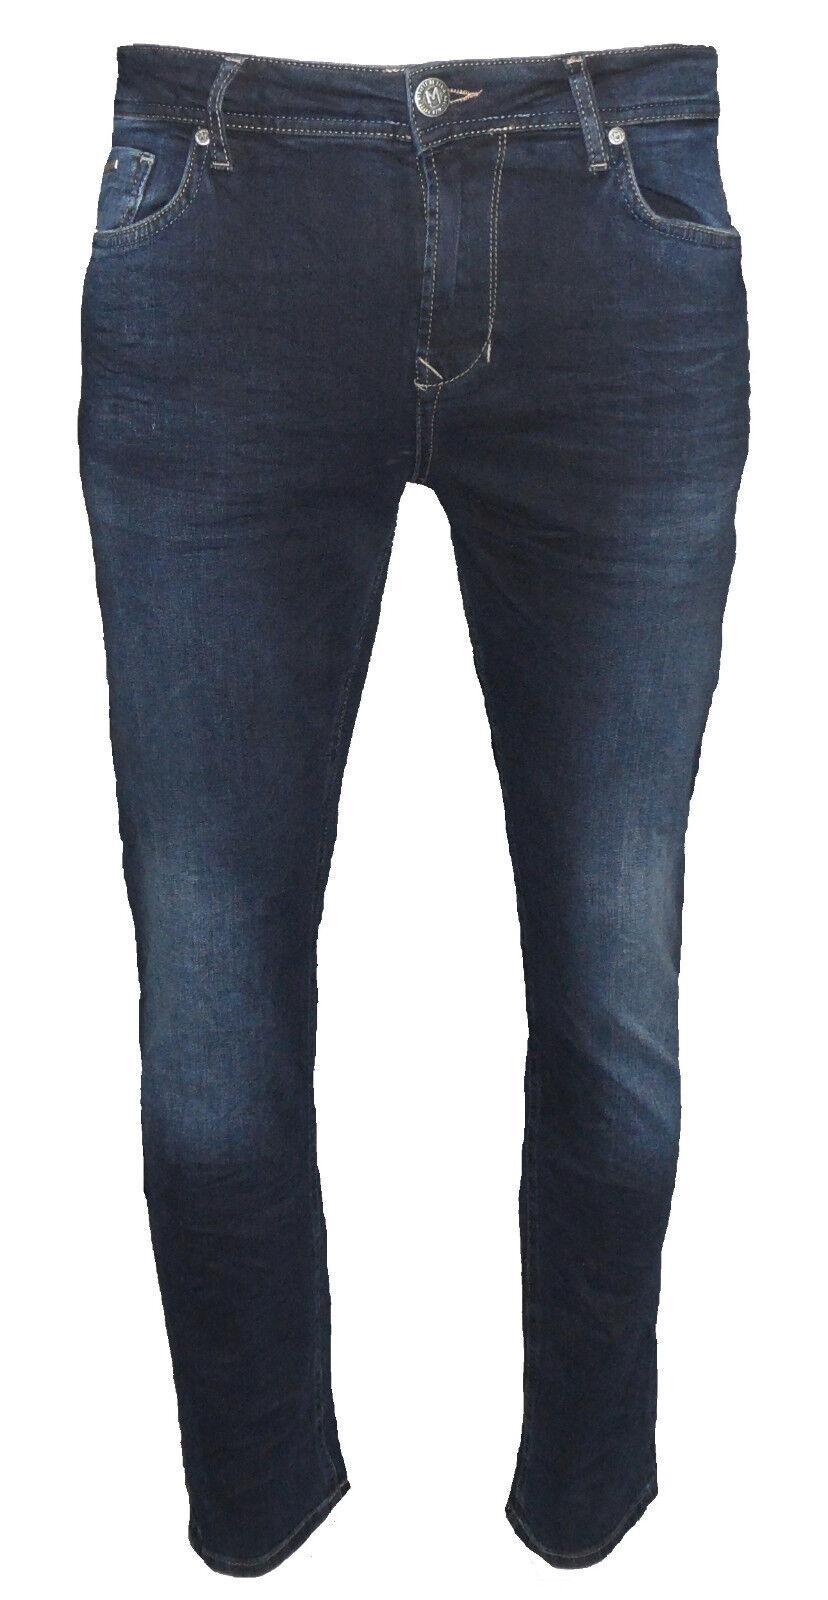 M.O.D Herren Jeans Cornell Slim Marine Blau